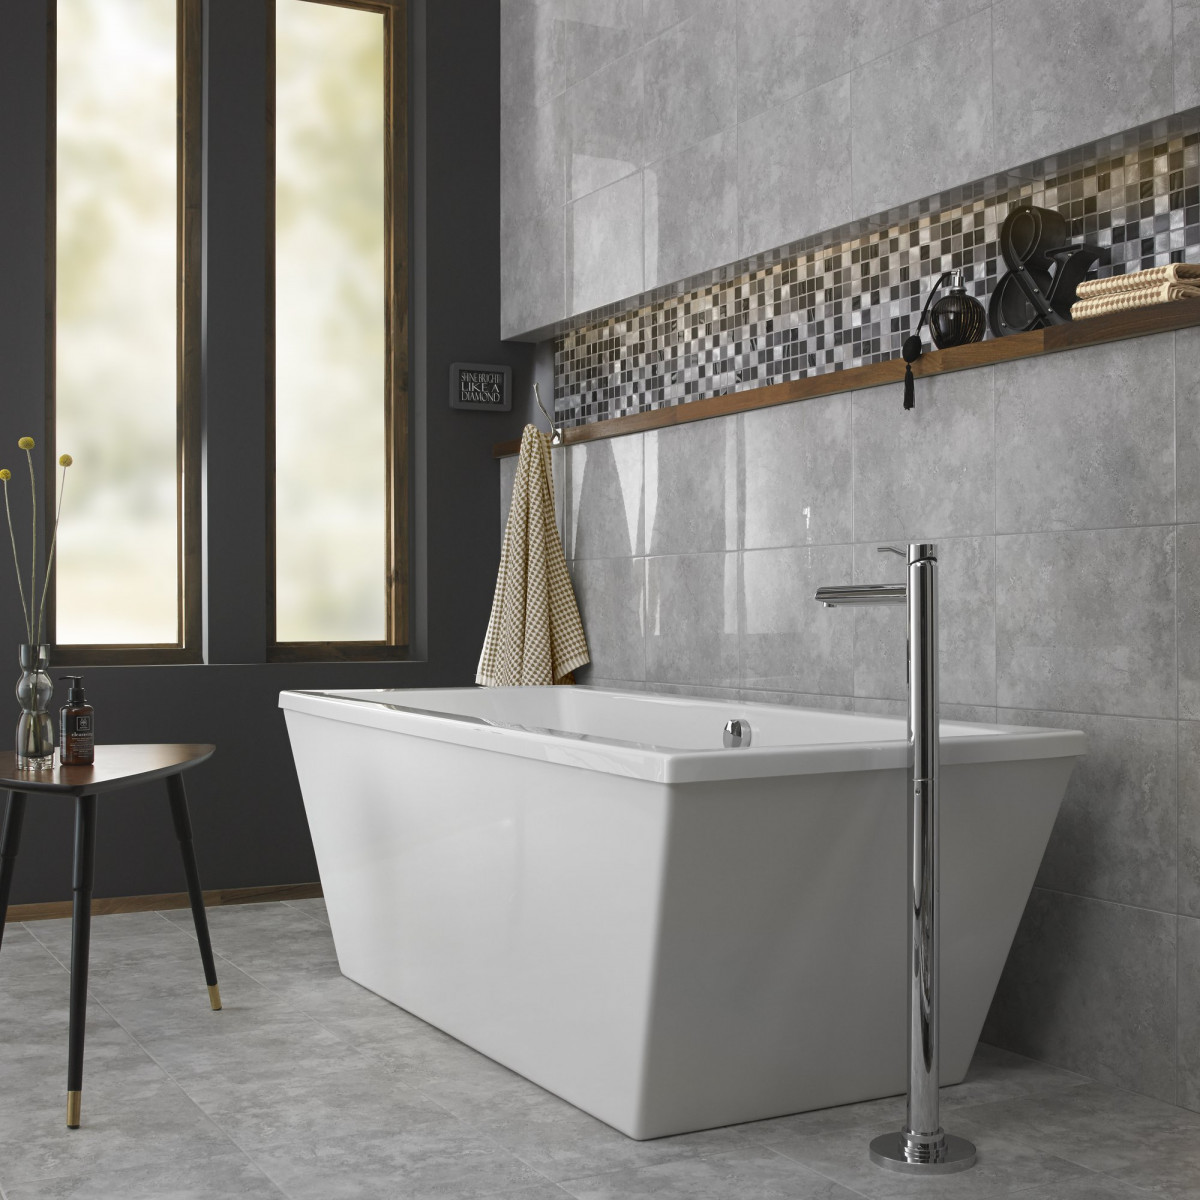 British ceramic tile grey gloss wall british ceramic tile dailygadgetfo Choice Image